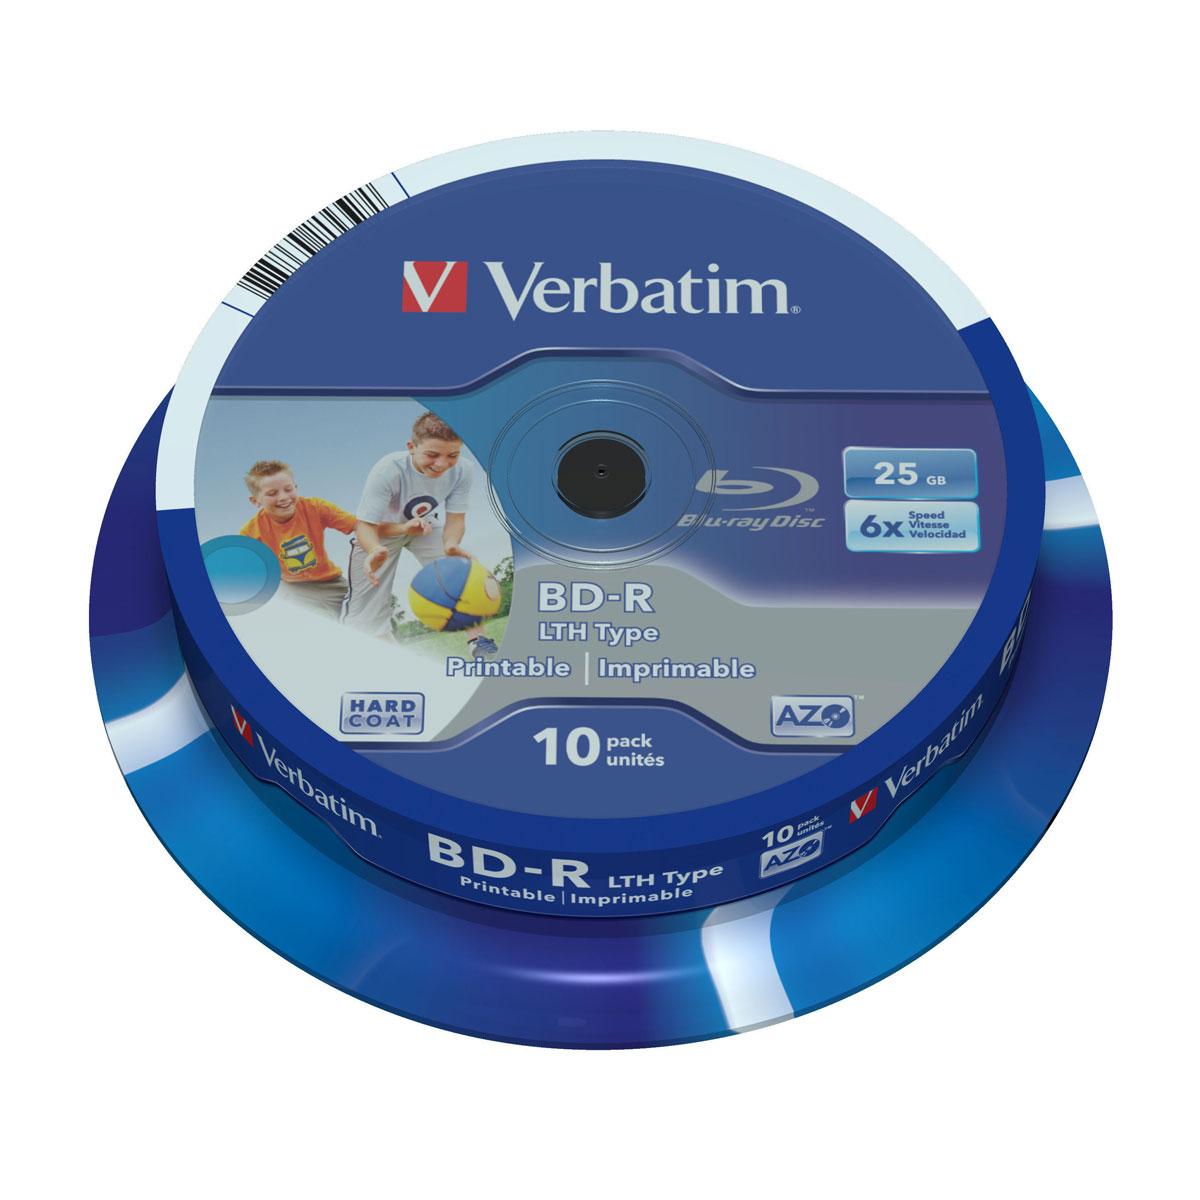 Blu-ray Verbatim BD-R LTH 25 Go certifié 6x imprimable (par 10, spindle) Verbatim BD-R LTH 25 Go certifié 6x imprimable (pack de 10, spindle)